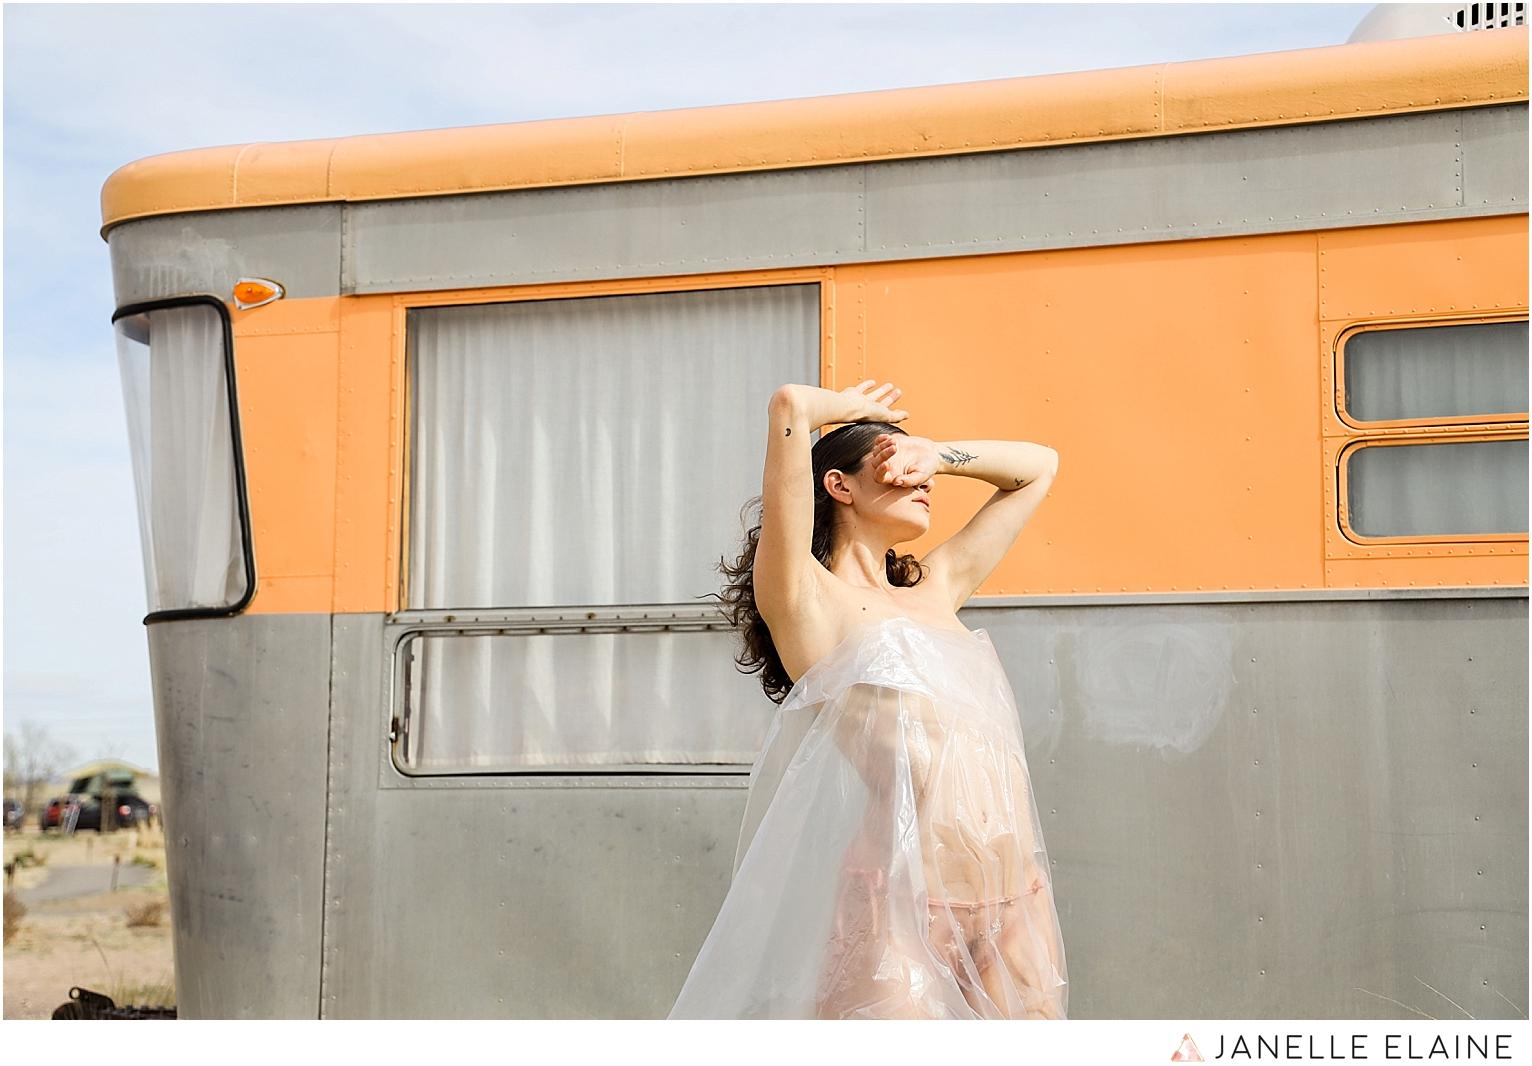 yeah field trip-marfa texas-el cosmico-bare essentials-workshop-nude-portrait-photographer-seattle photographer janelle elaine-7.jpg